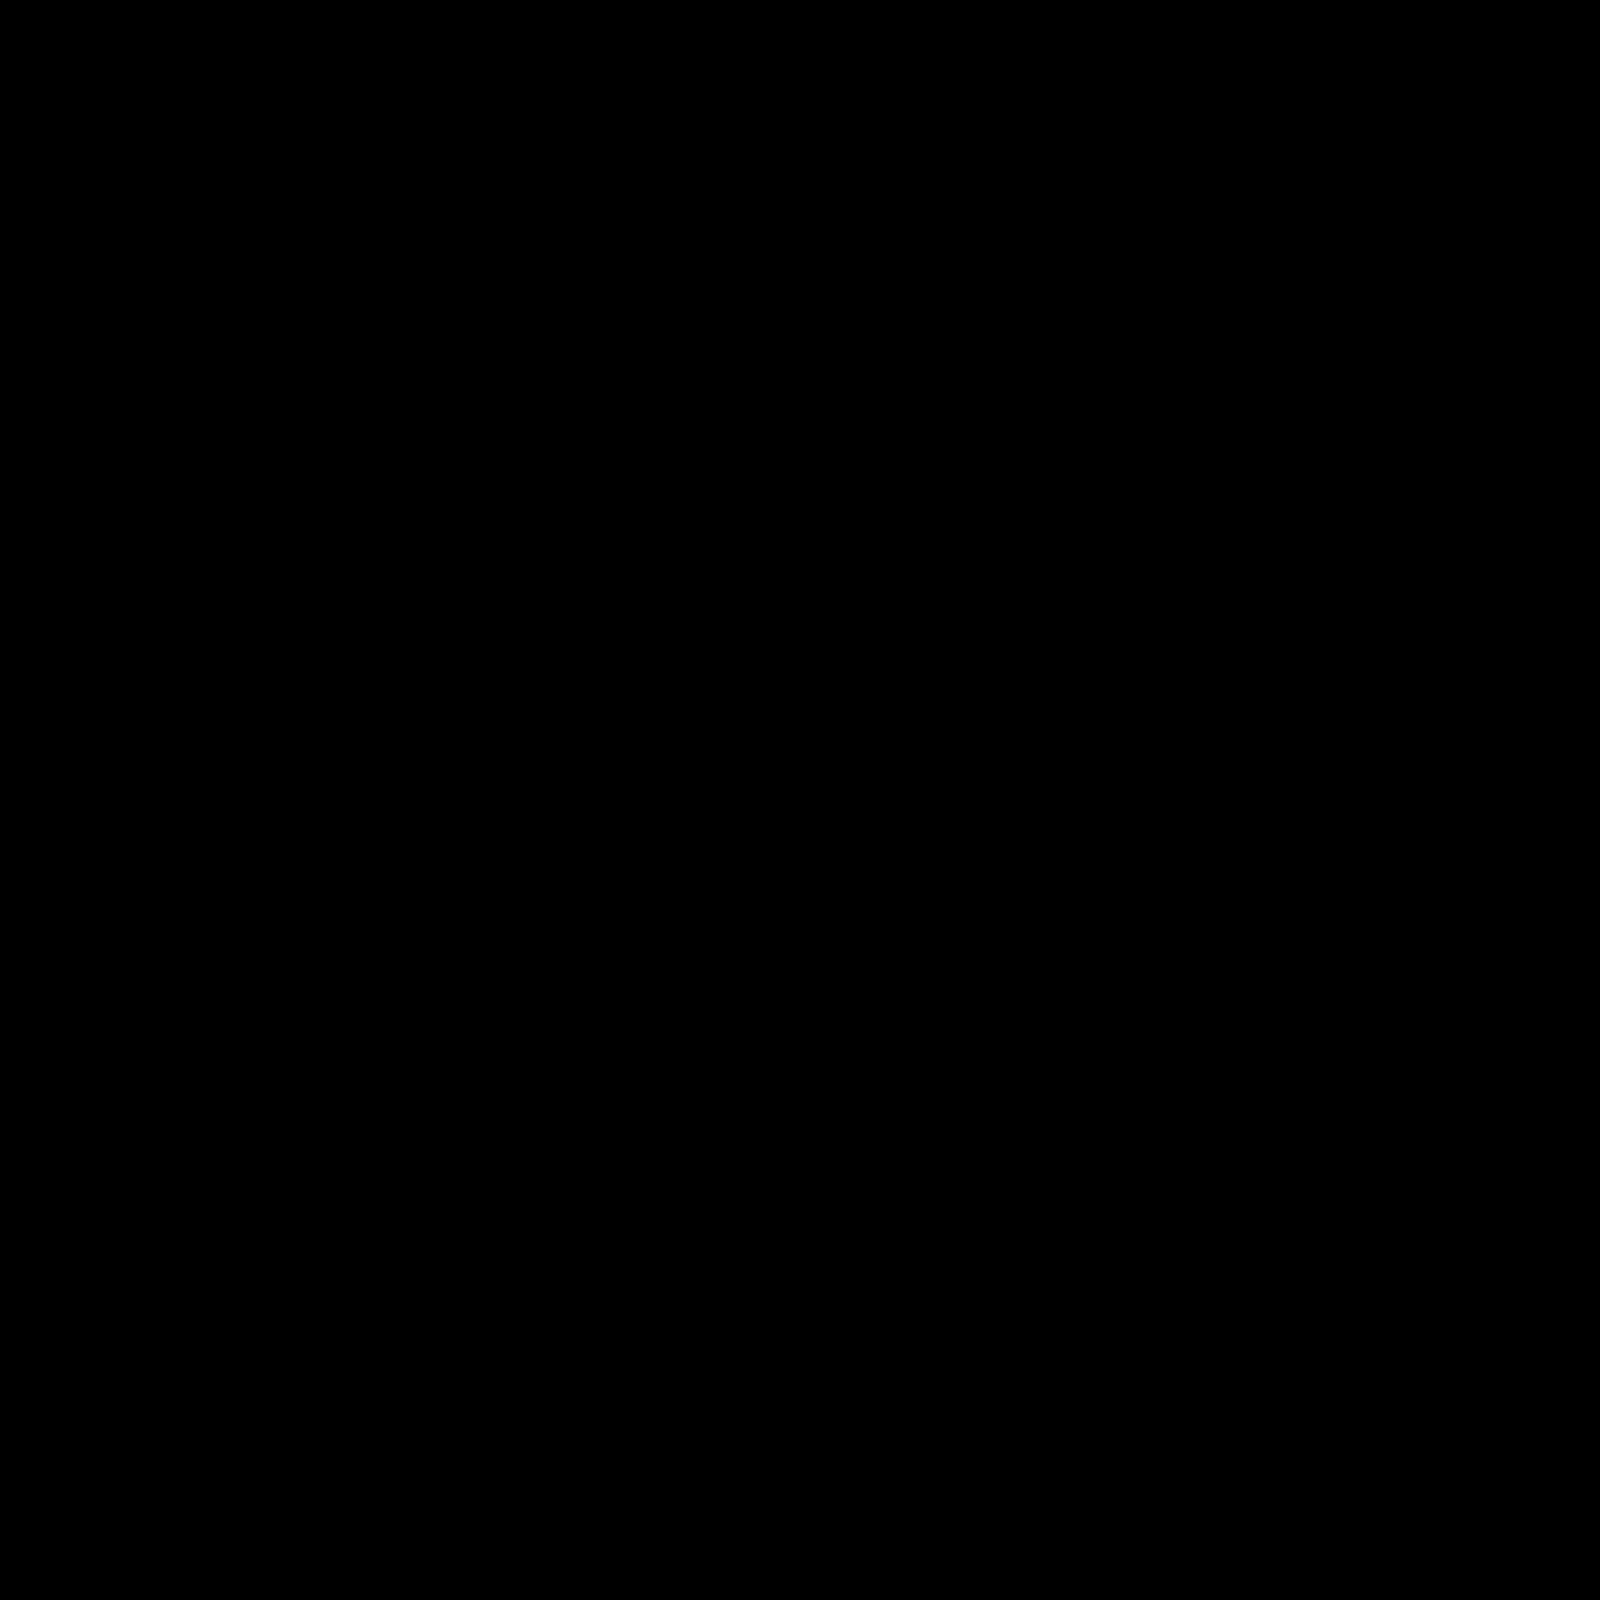 Walrus Mustache Filled icon